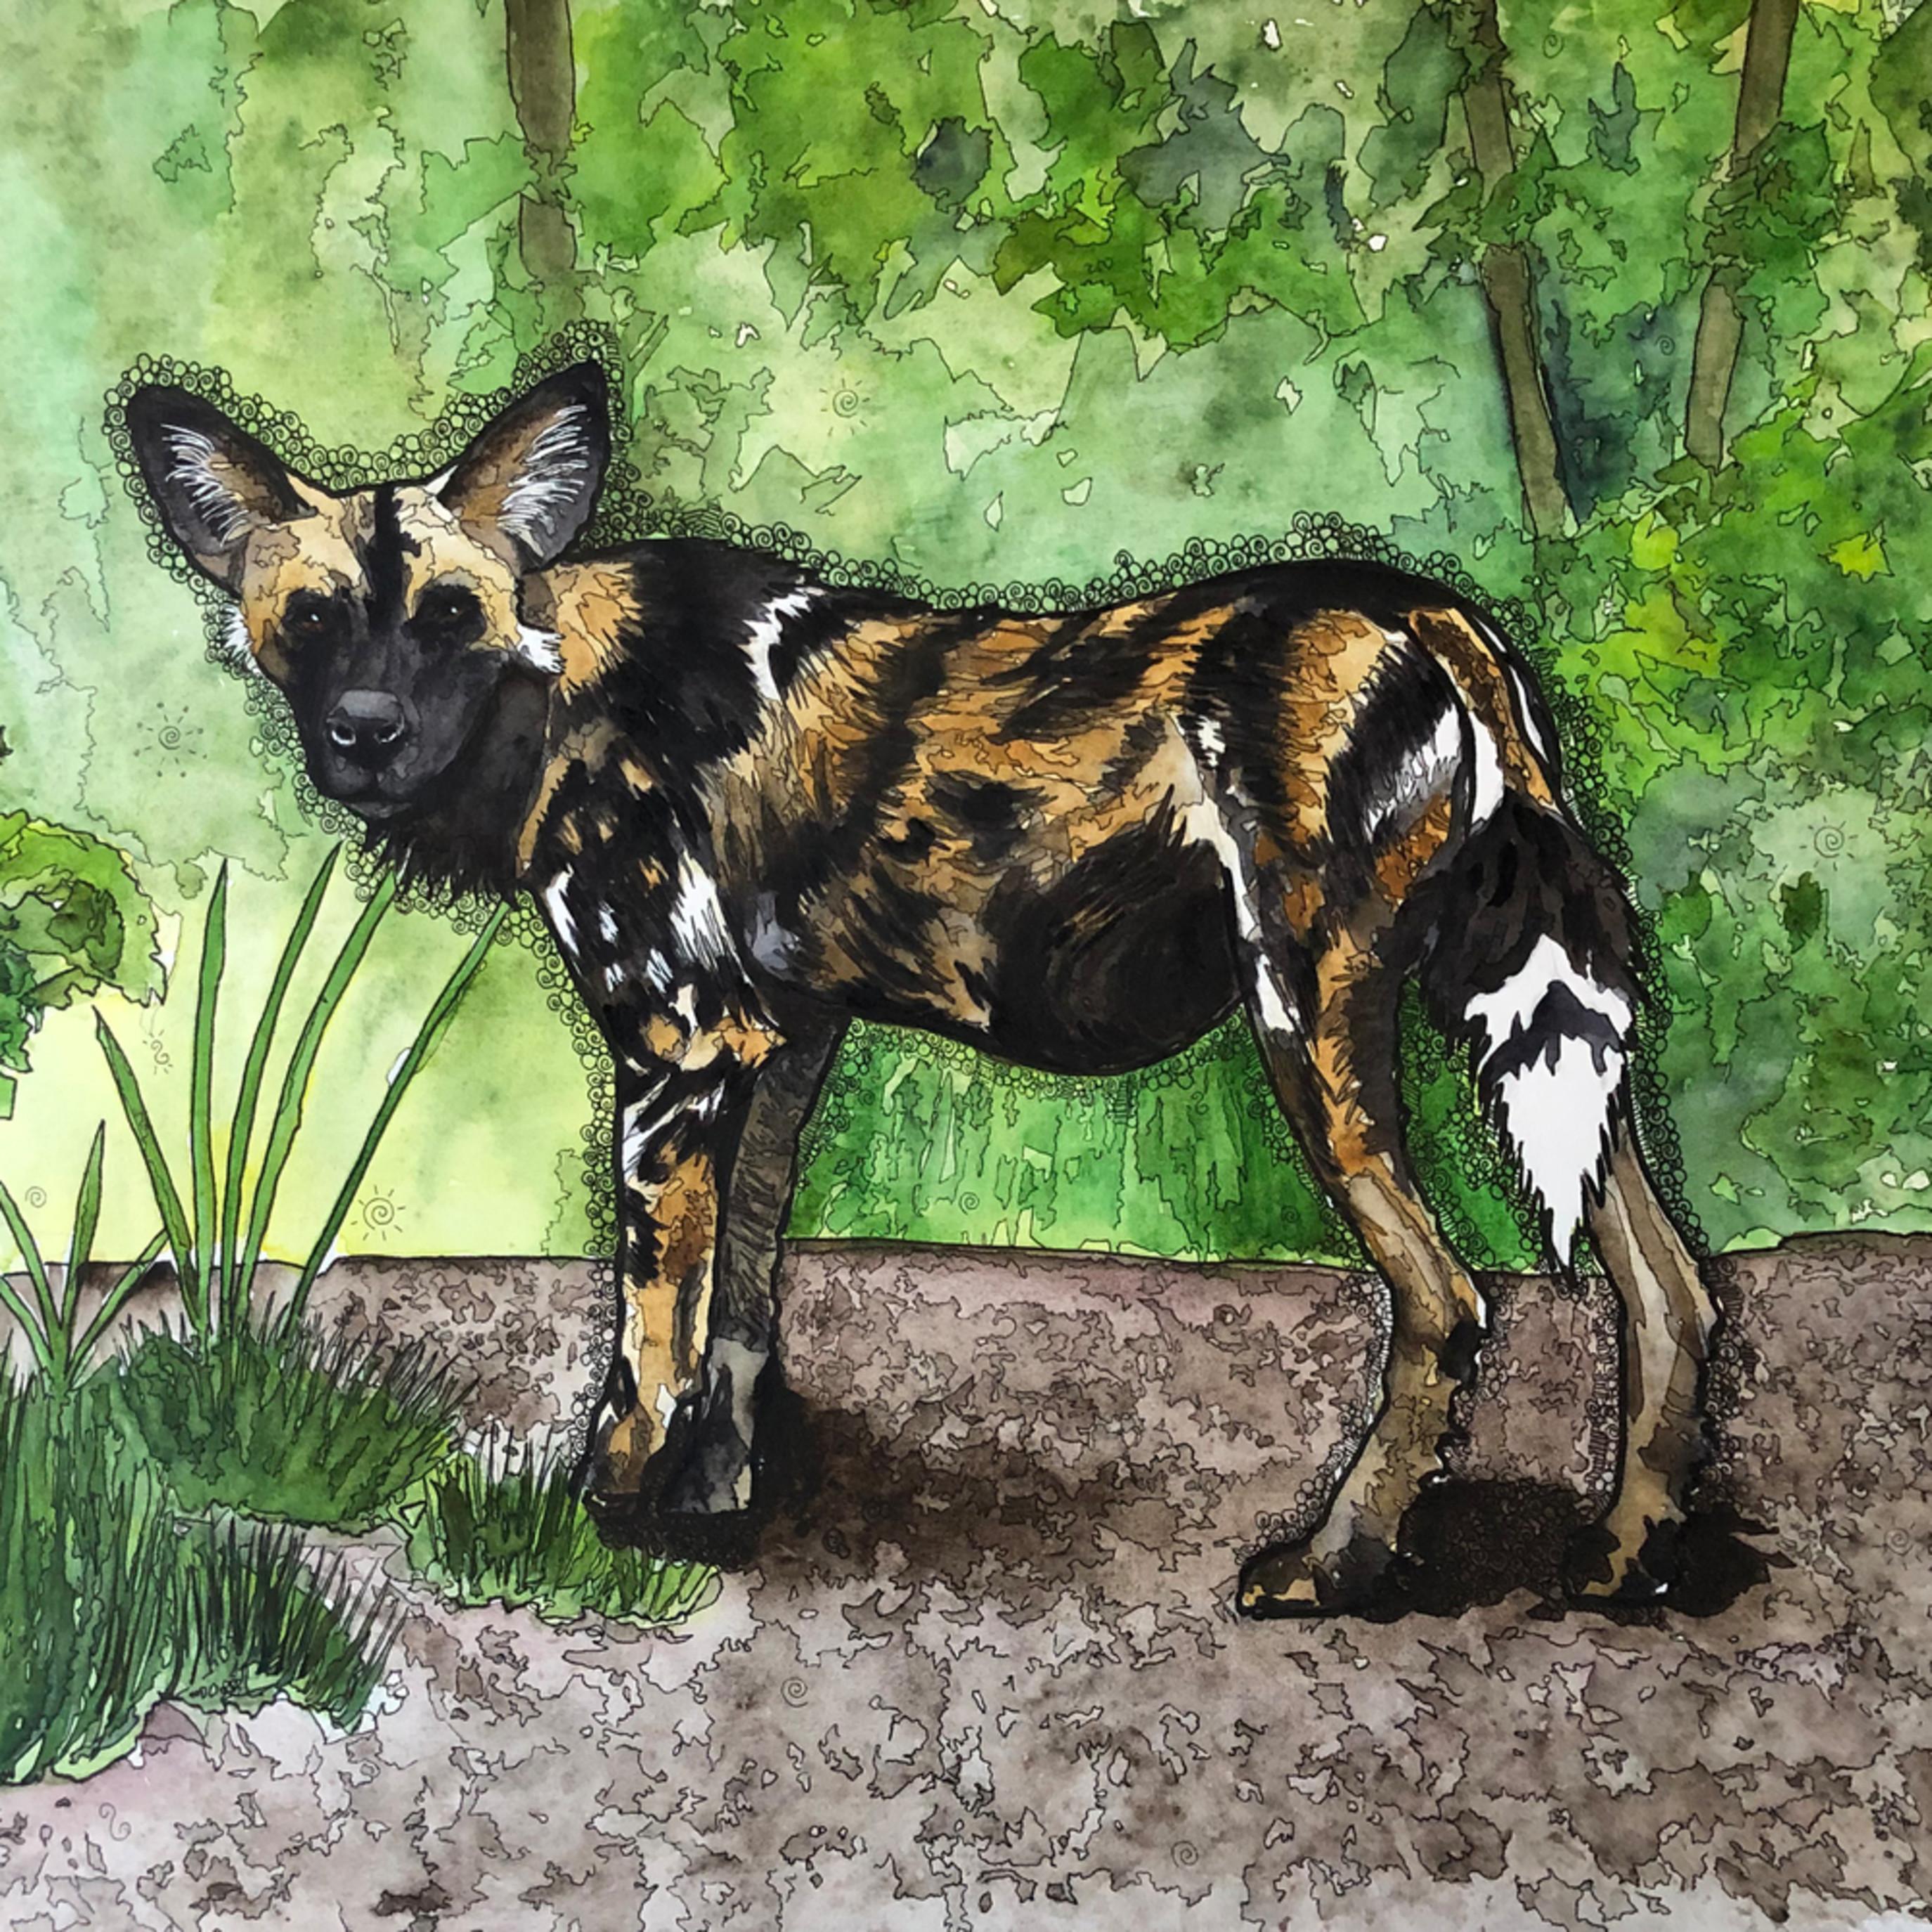 Africanpainteddog grjei0